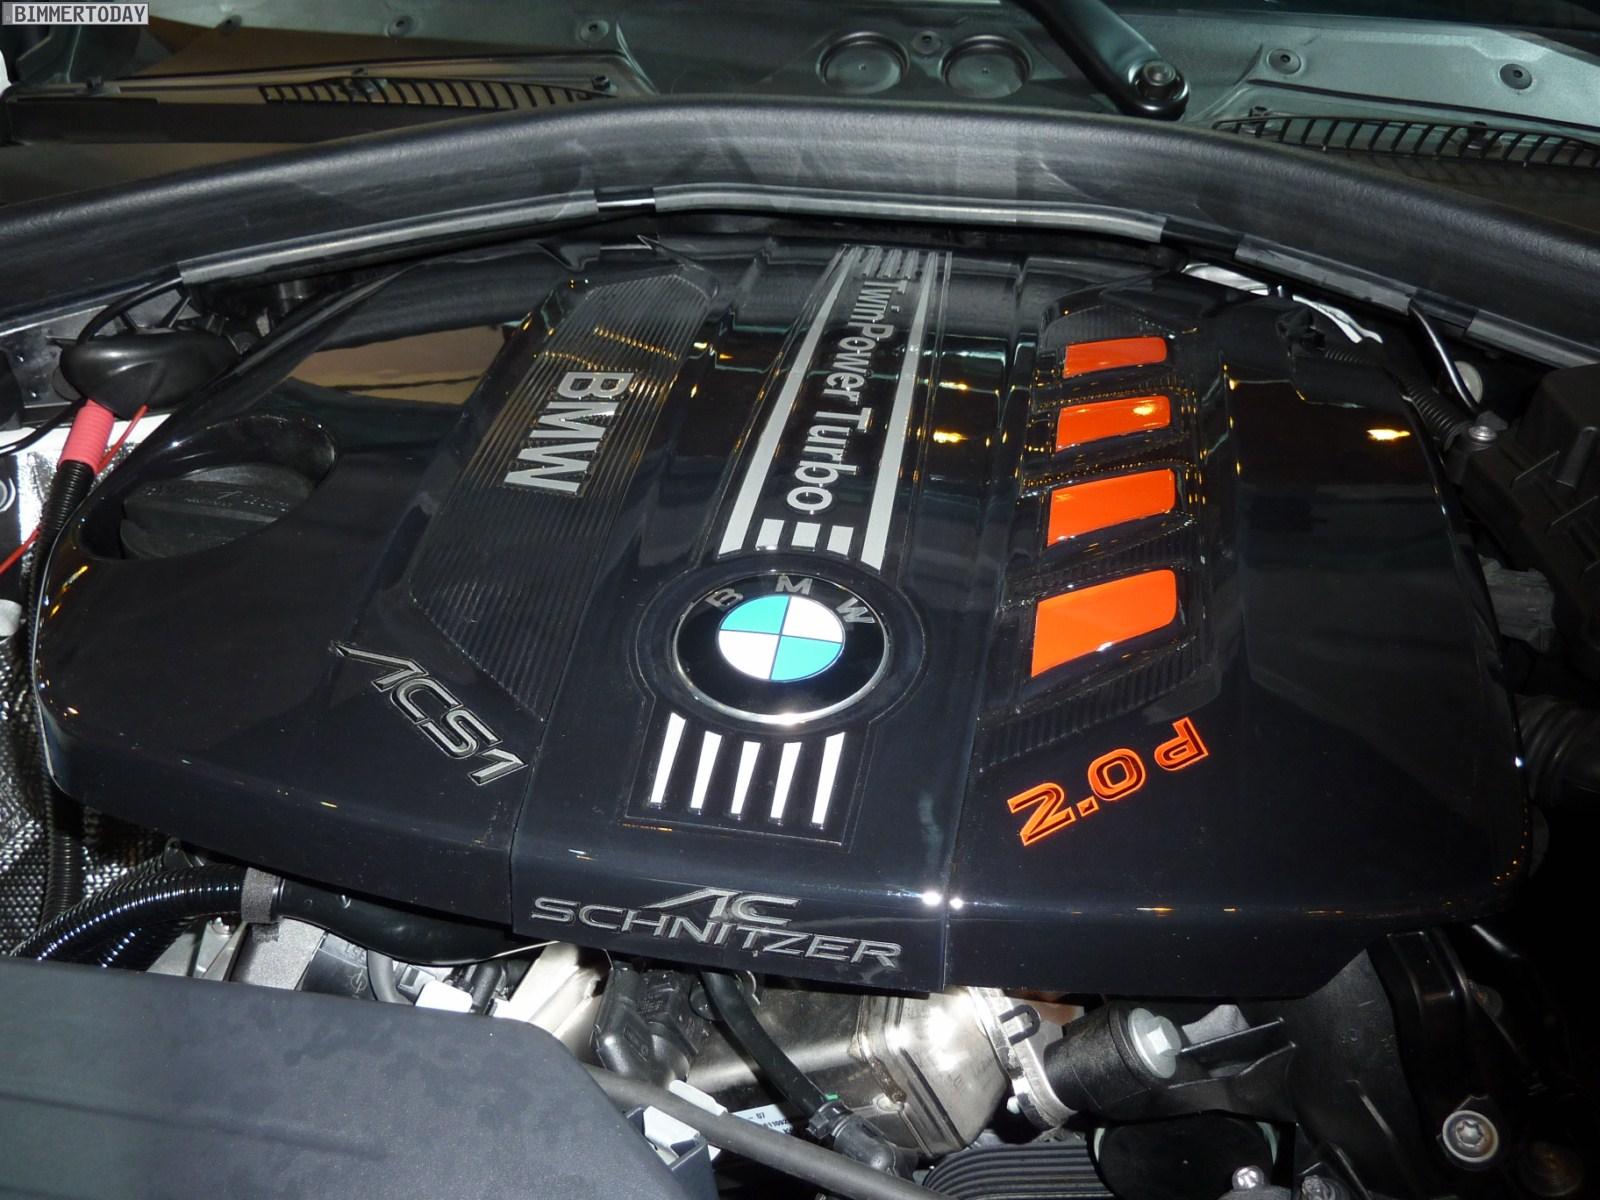 BMW 1er F20 ACS1 AC Schnitzer Essen Motor Show 2011 Motorraum 01